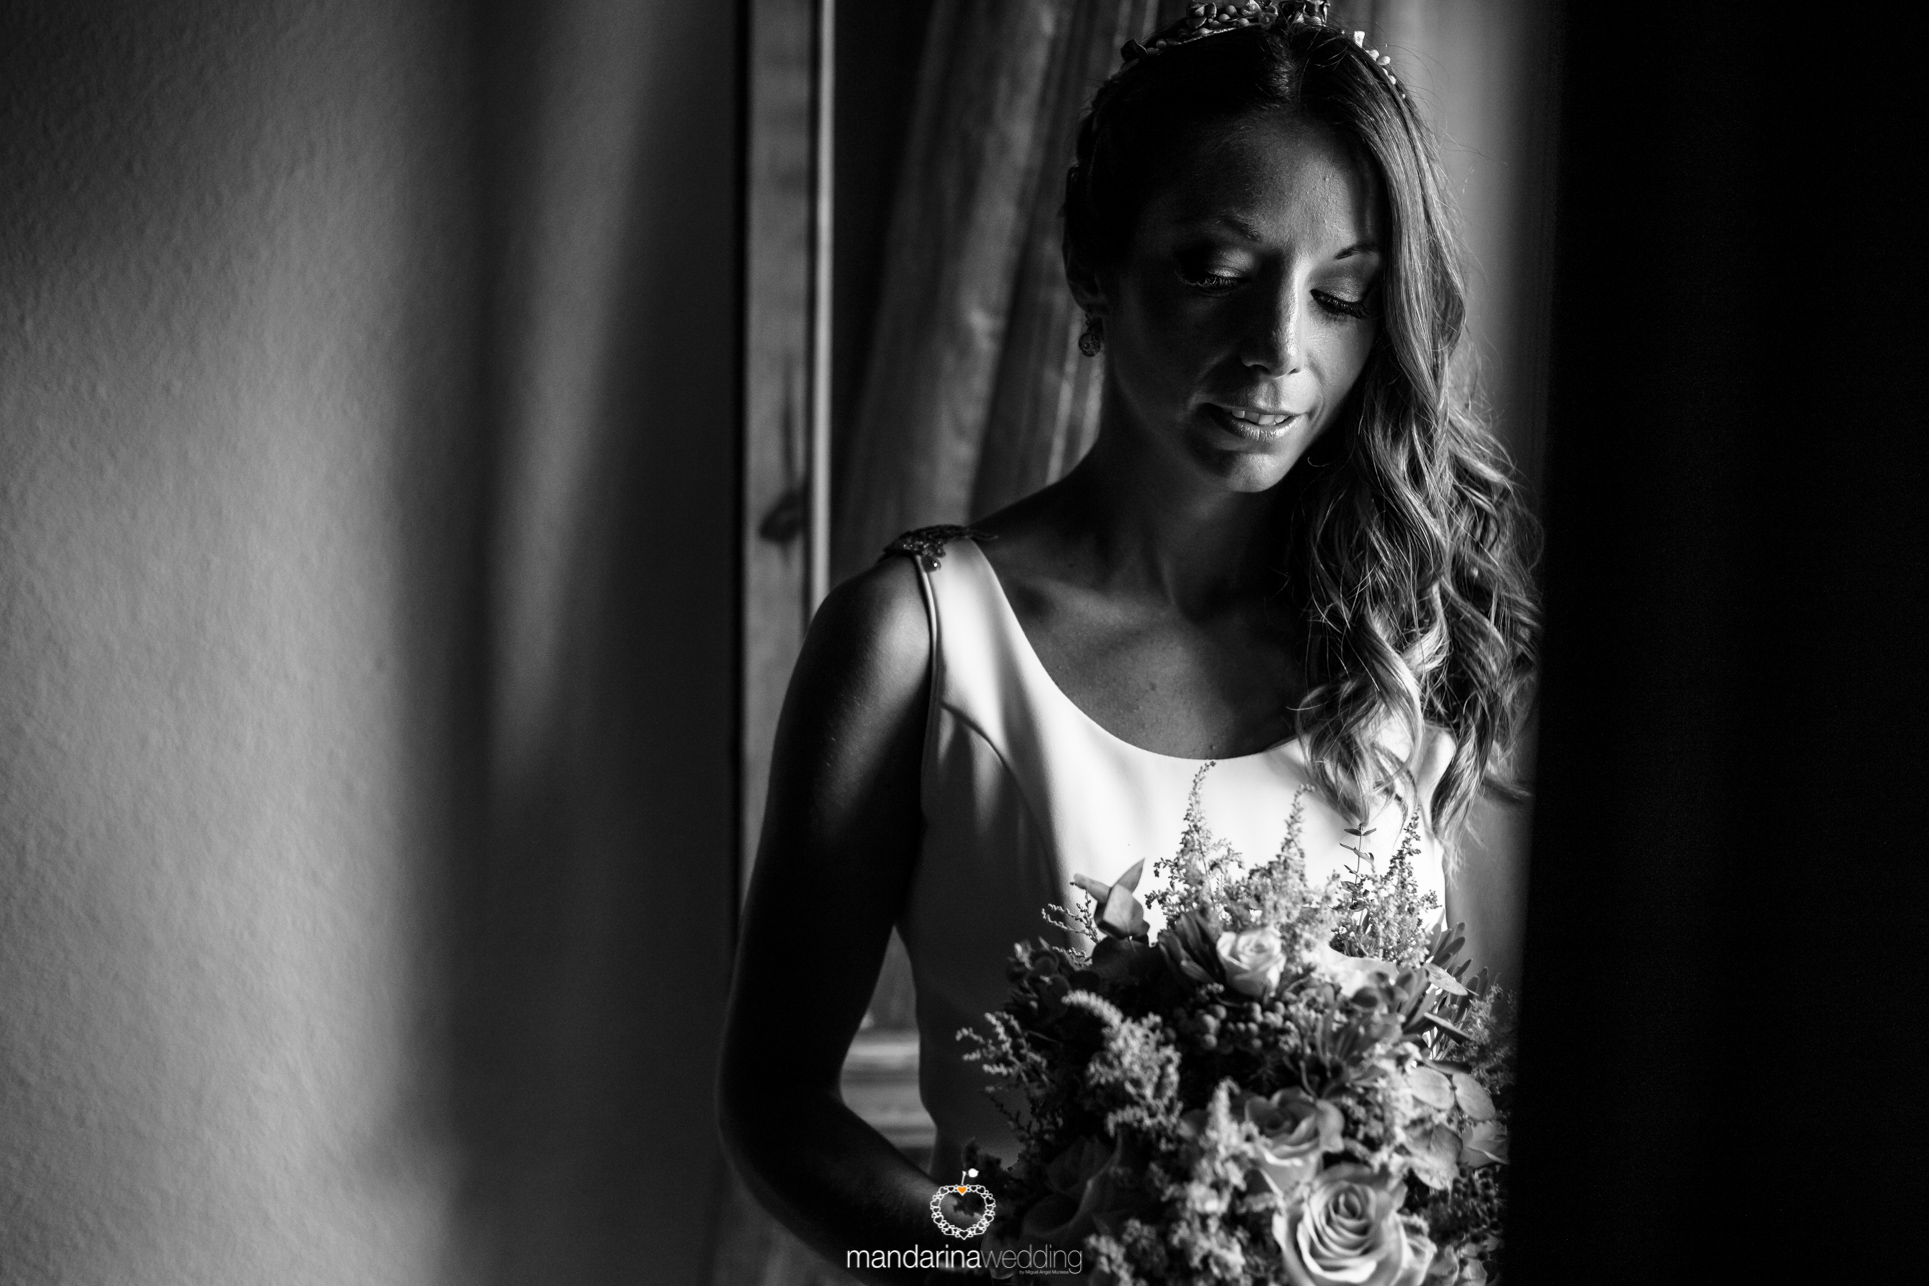 mandarina wedding, fotografo boda pais vasco, fotografo boda zaragoza, fotógrafo boda soria, fotografo boda Madrid, fotógrafo boda tarragona-08